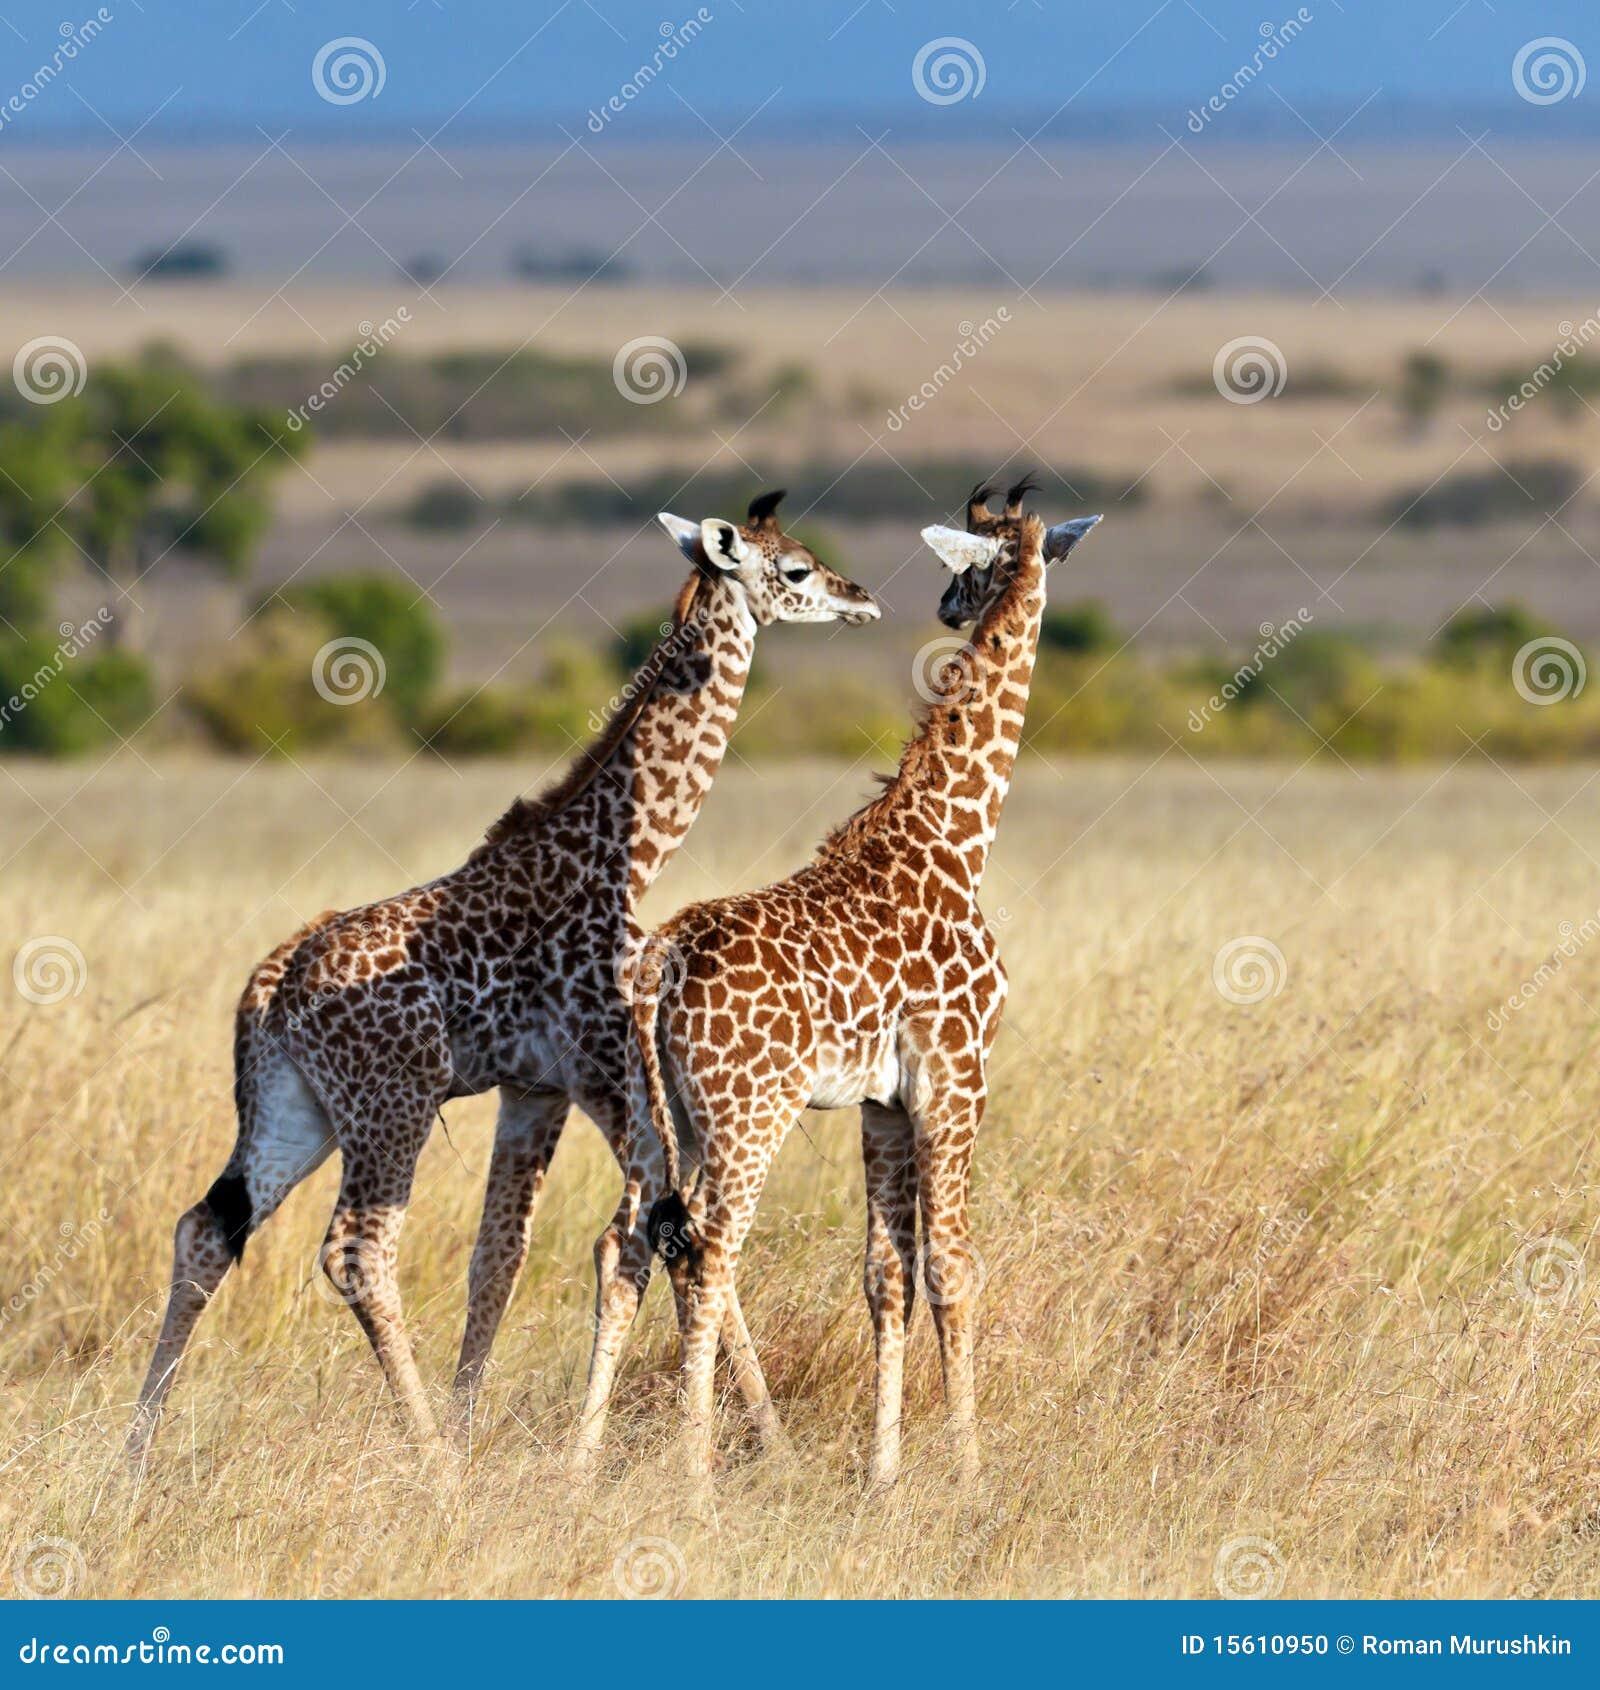 Two baby giraffe walk on the savannah